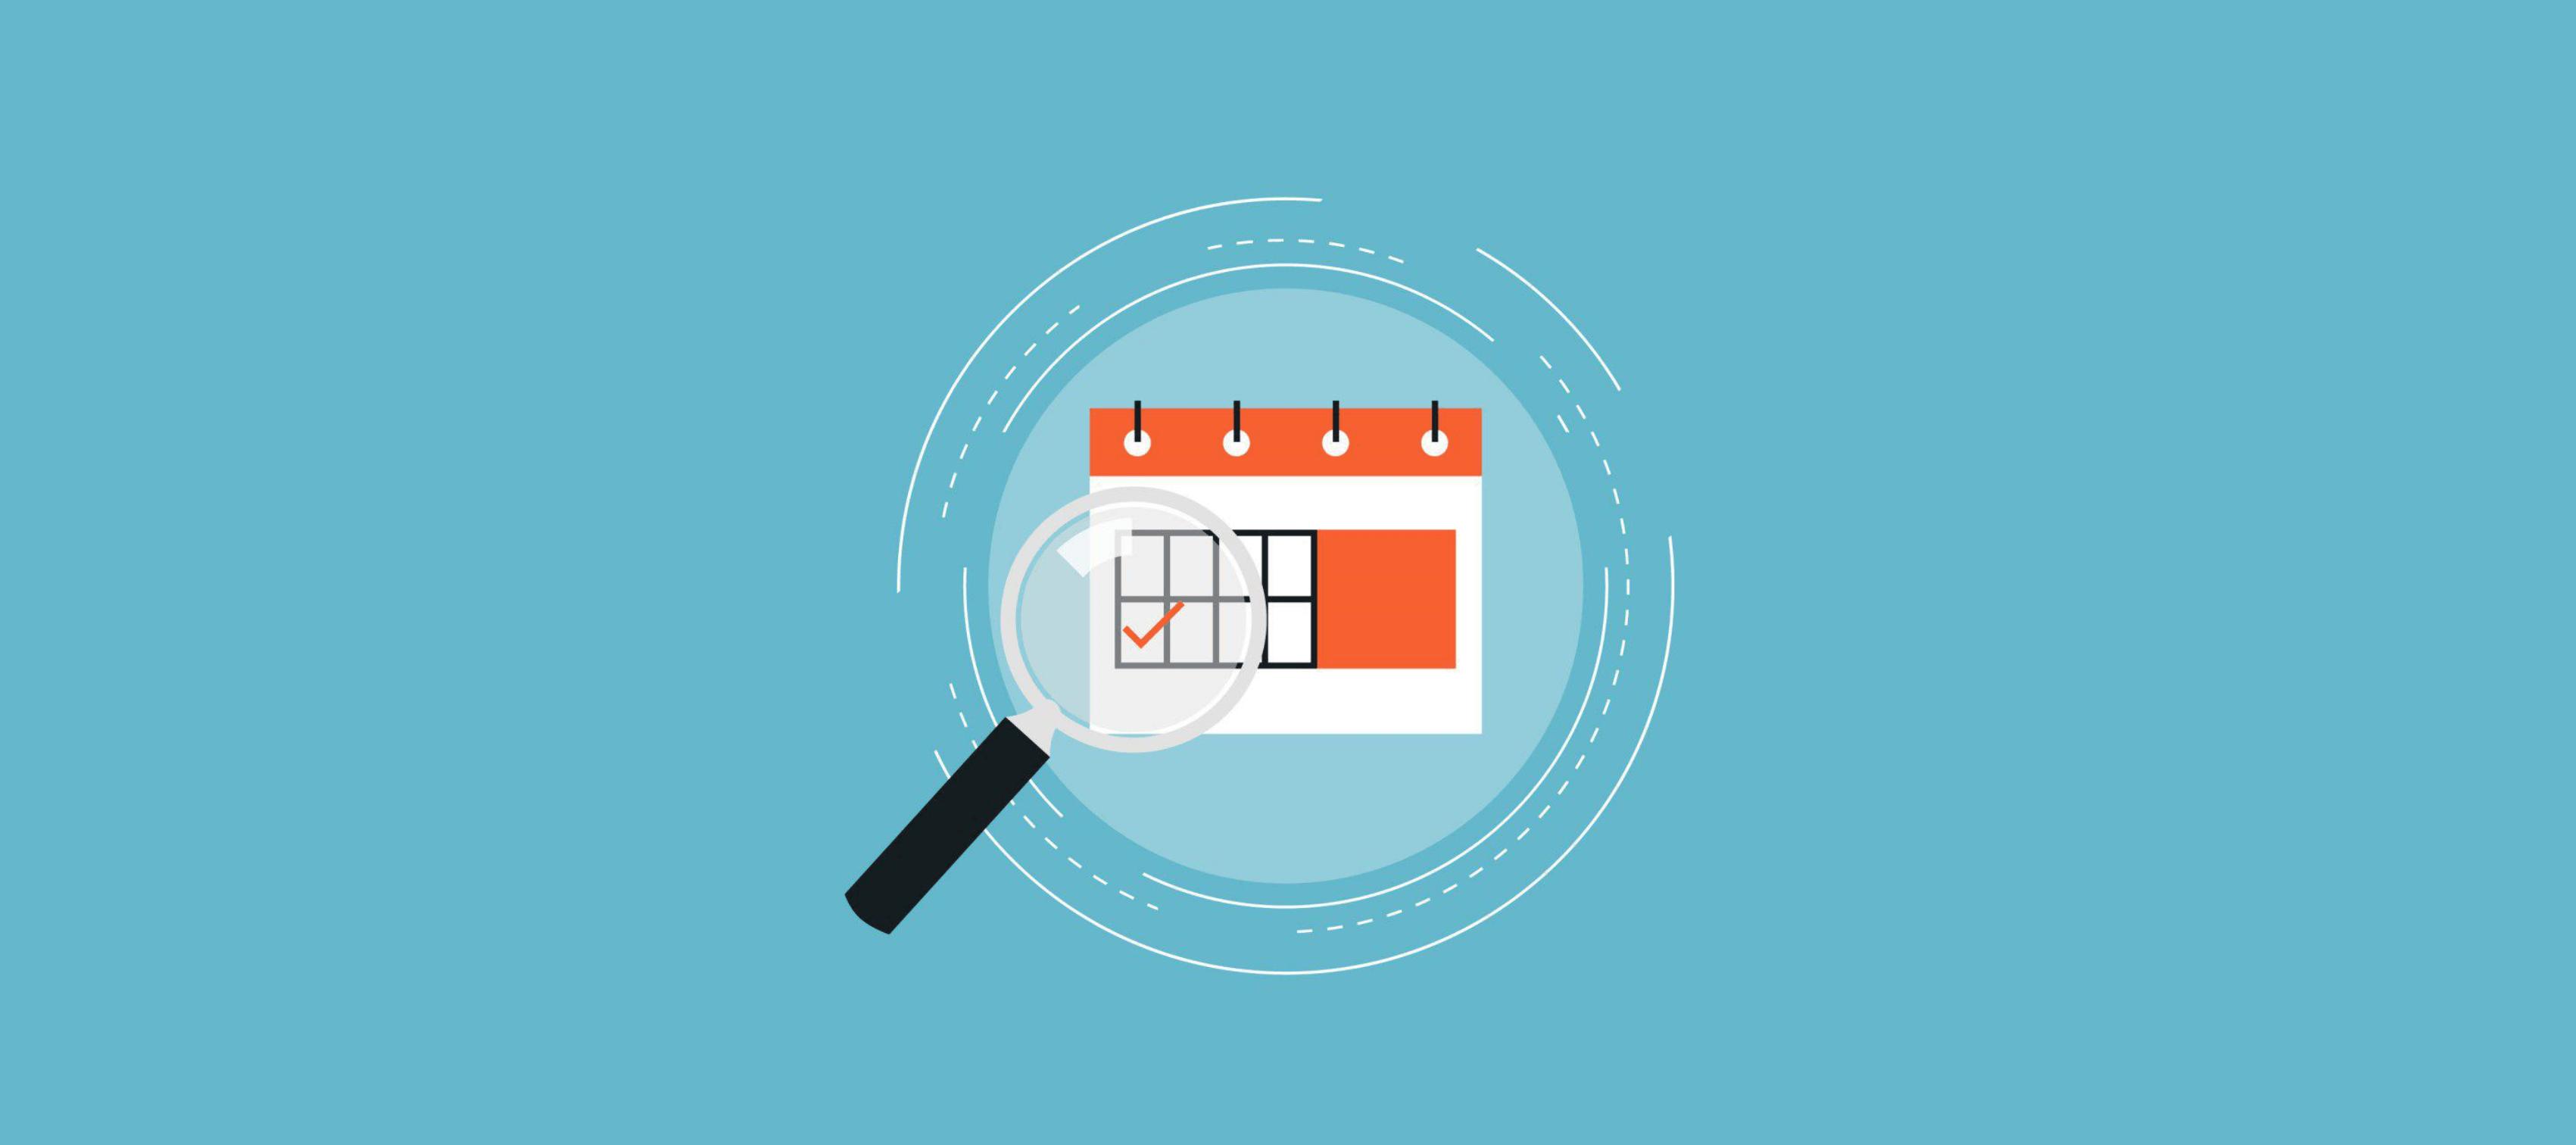 Agencia Tributaria Calendario 2020.Calendario Del Contribuyente 2020 Aeat